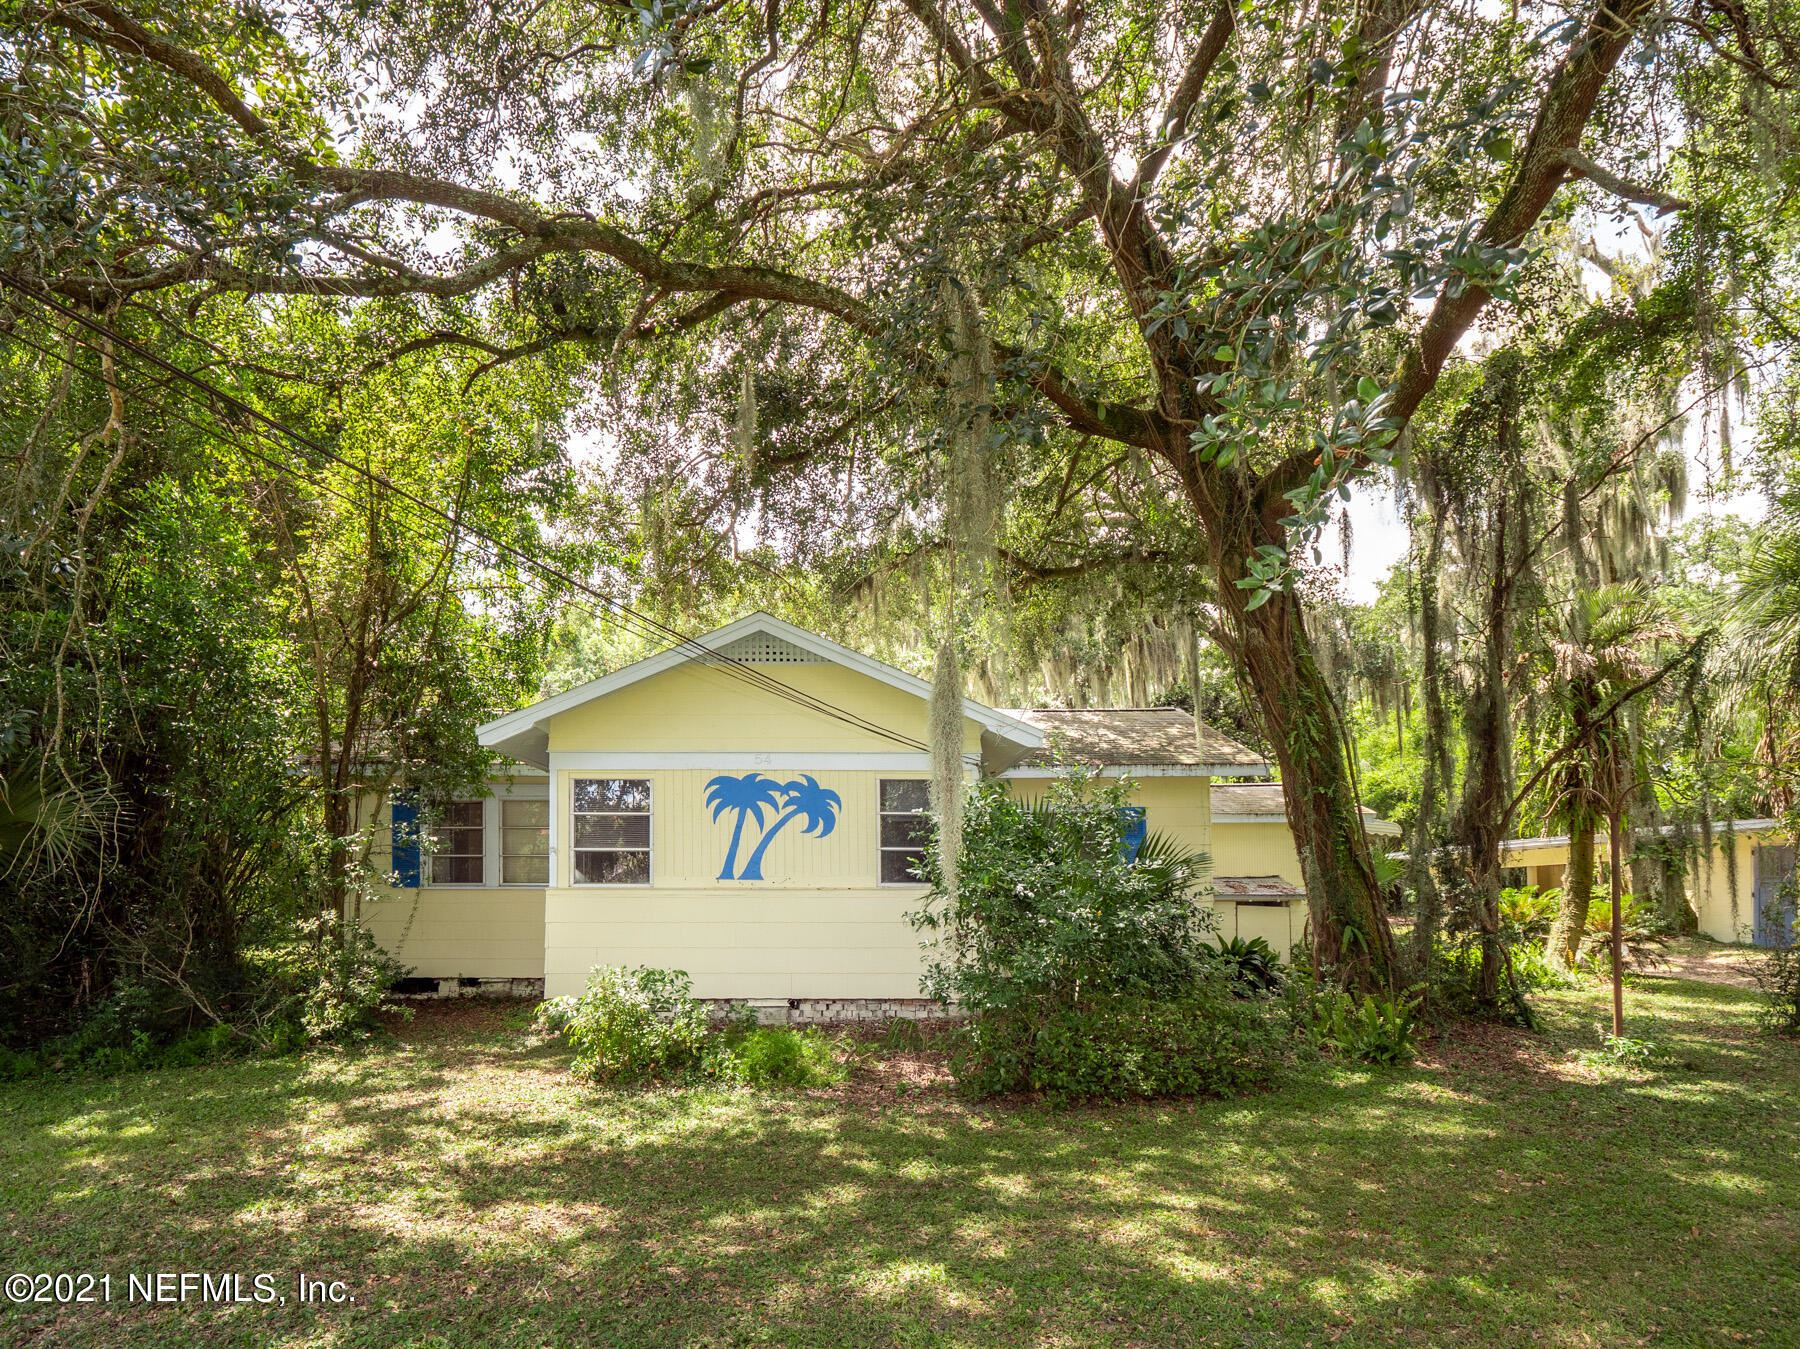 54 TALLULAH AVE #Lot No: 18, Jacksonville, FL 32208 - MLS#: 1129302